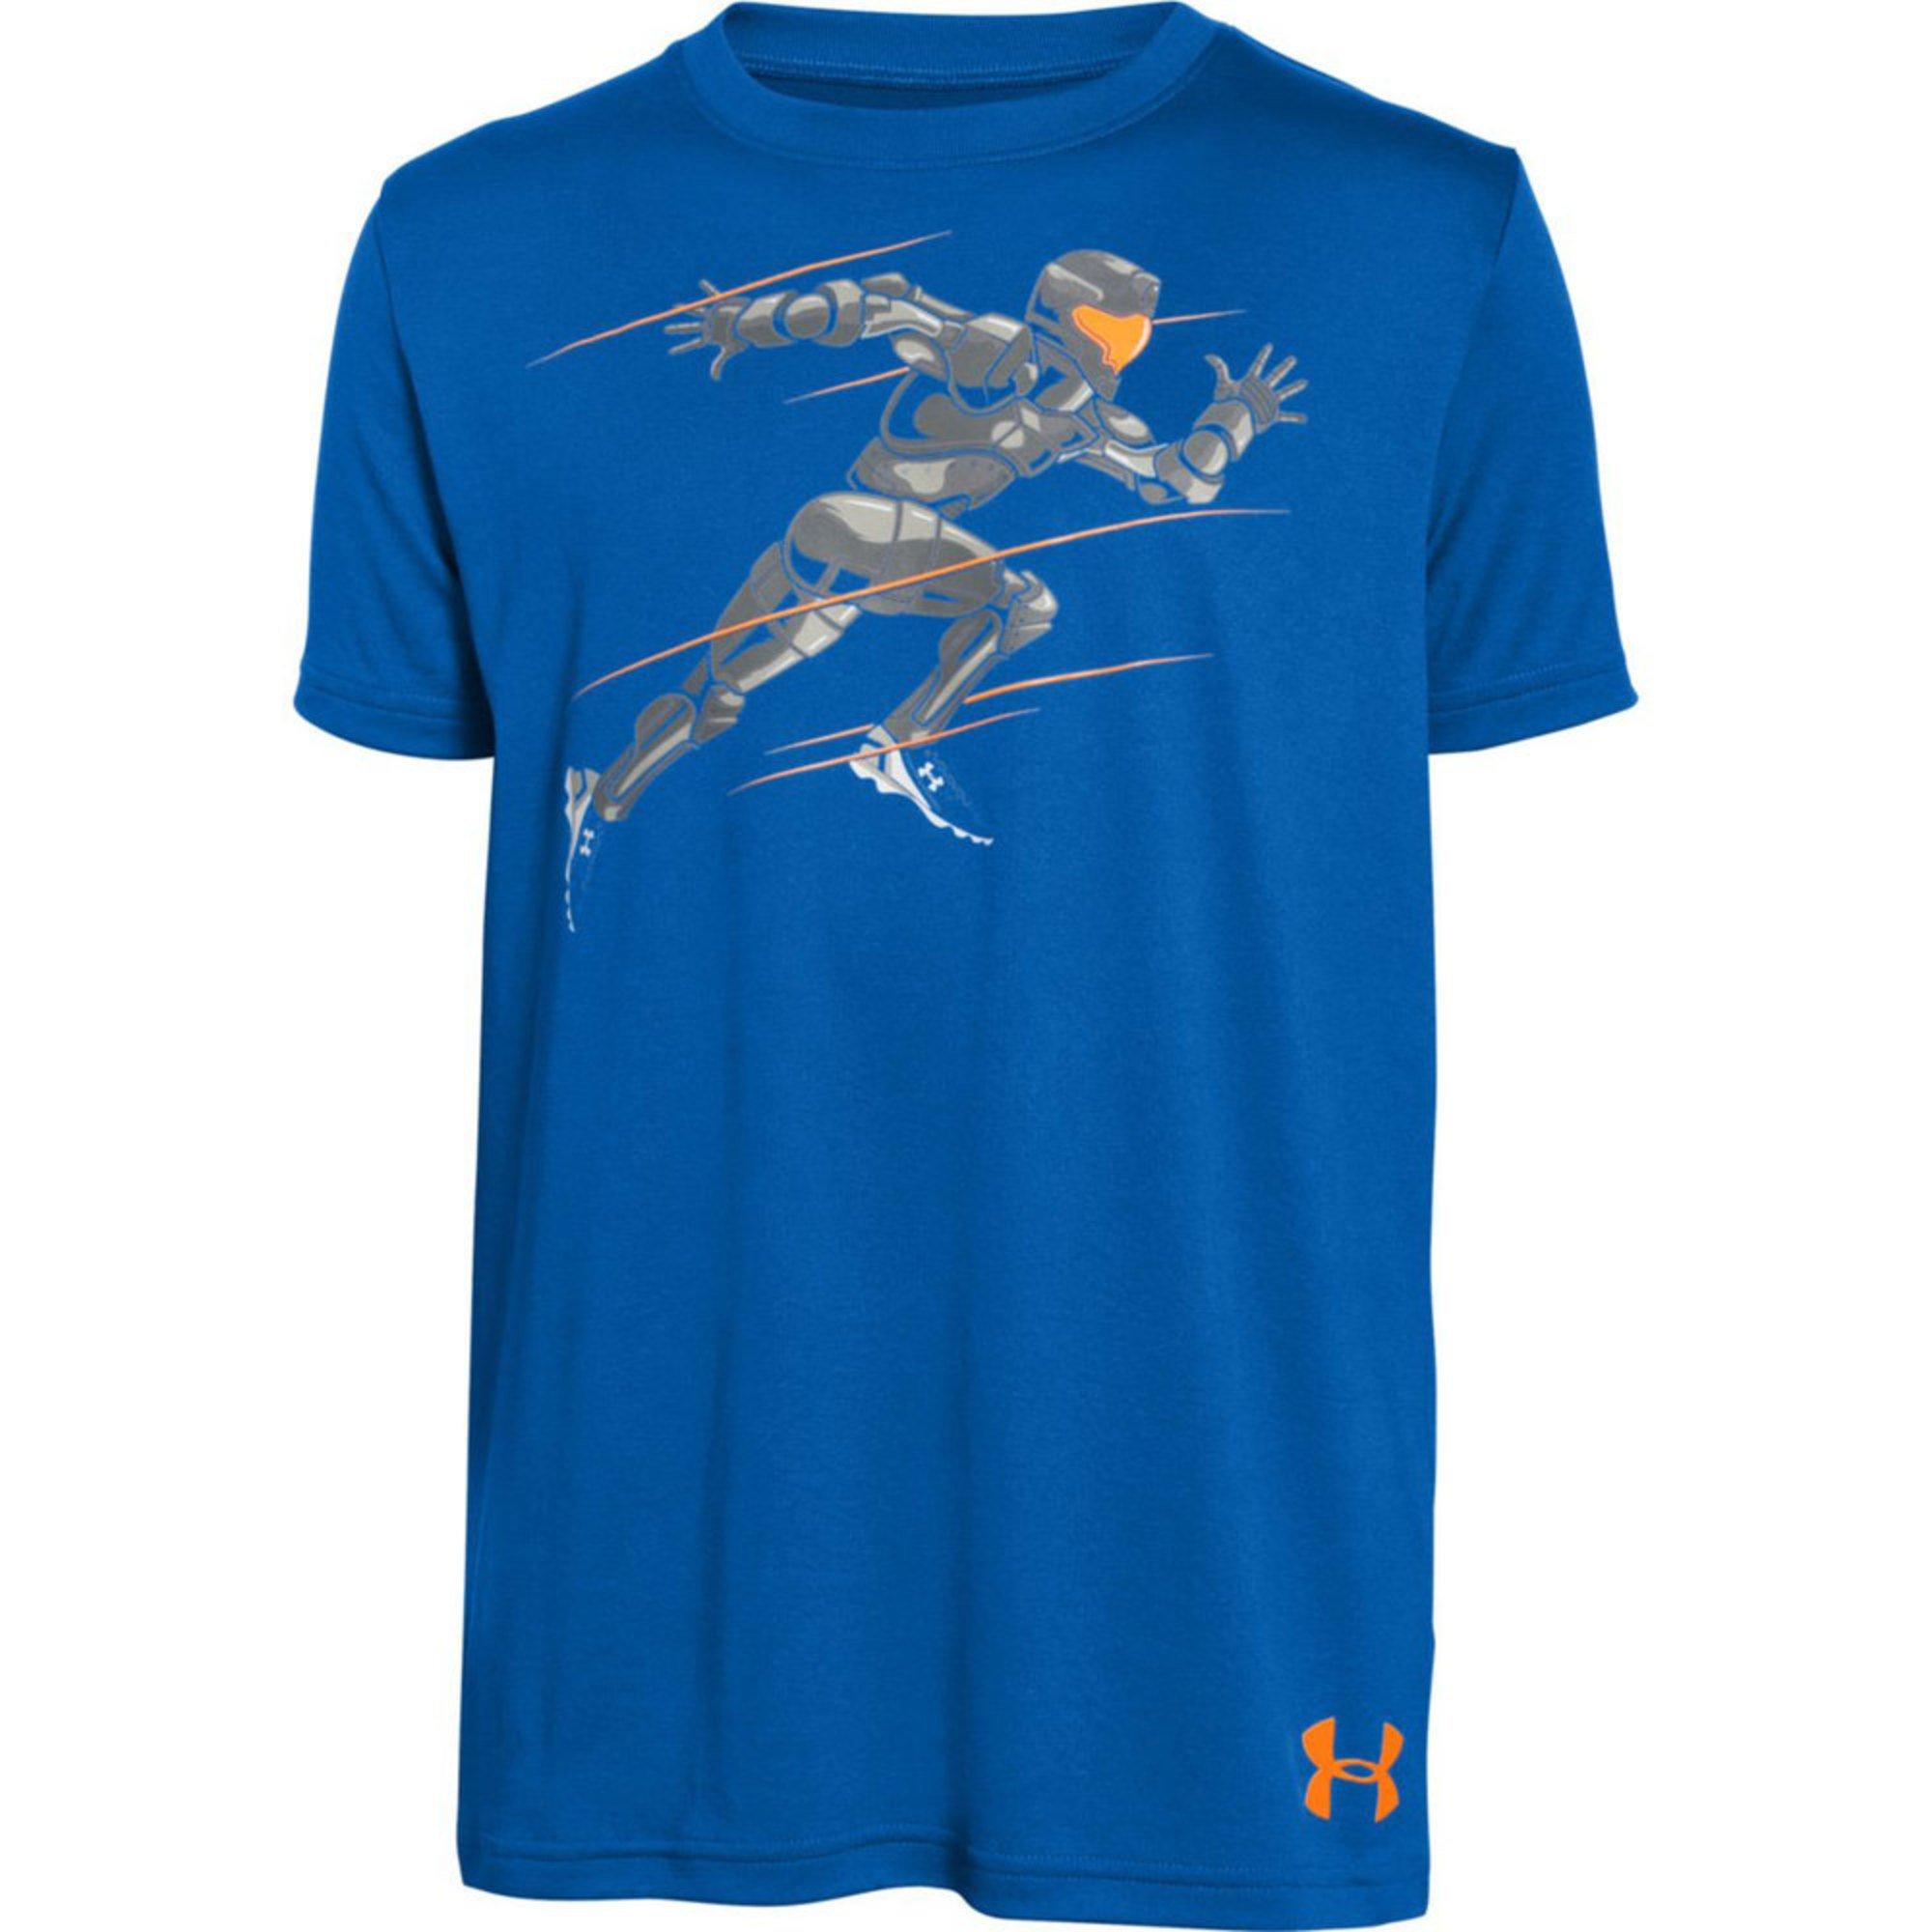 Under Armour Big Boys 39 Running Man Tee Big Boys 39 Shirts